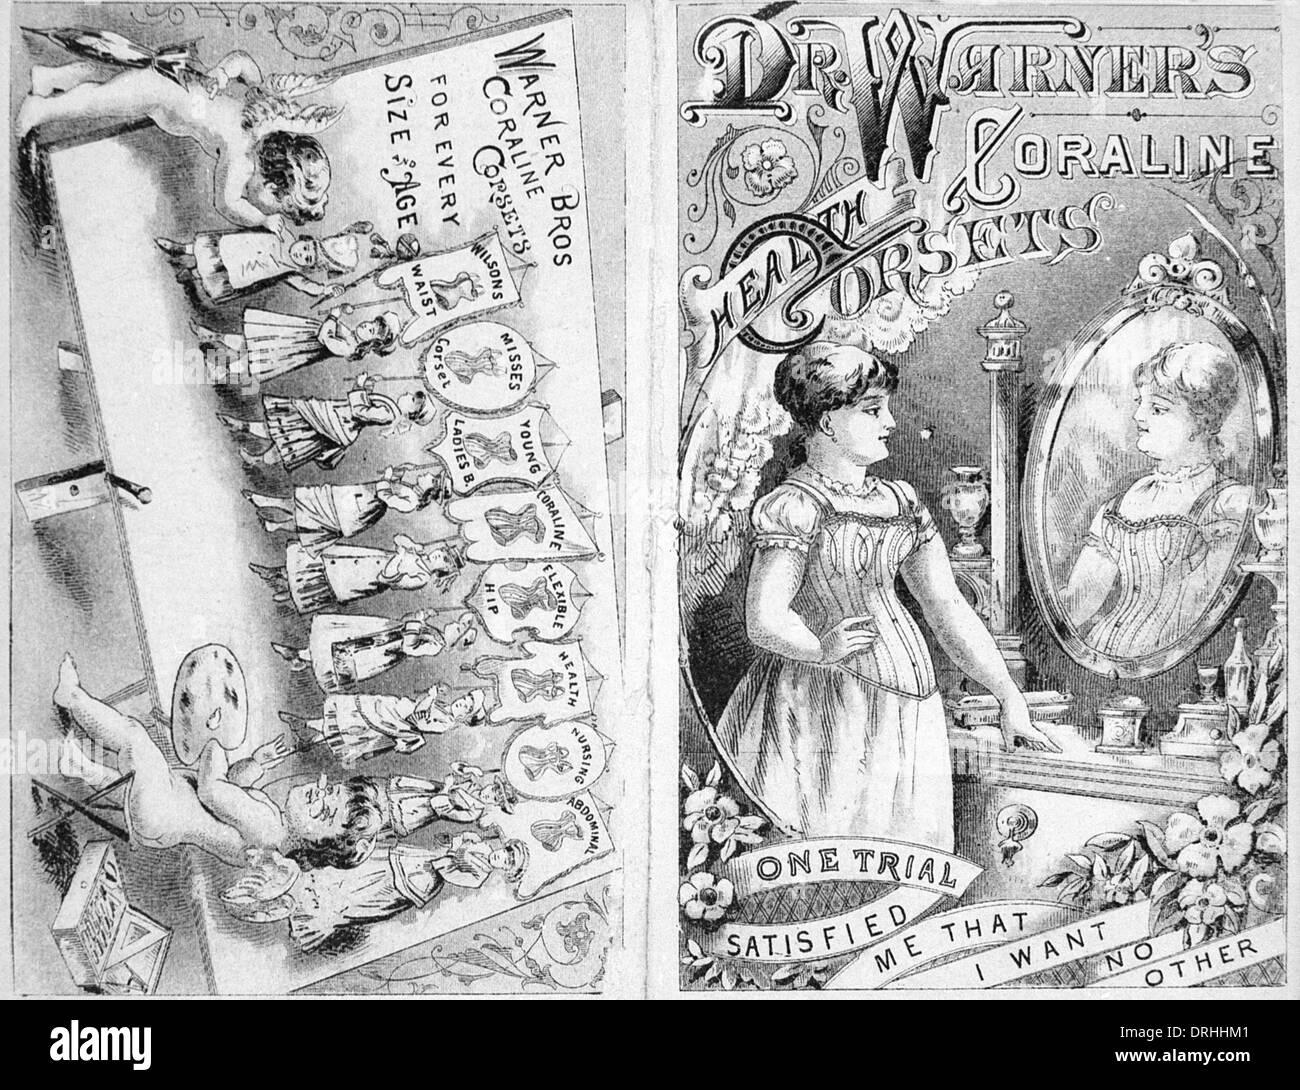 Dr Warners Coraline health corsets - Stock Image